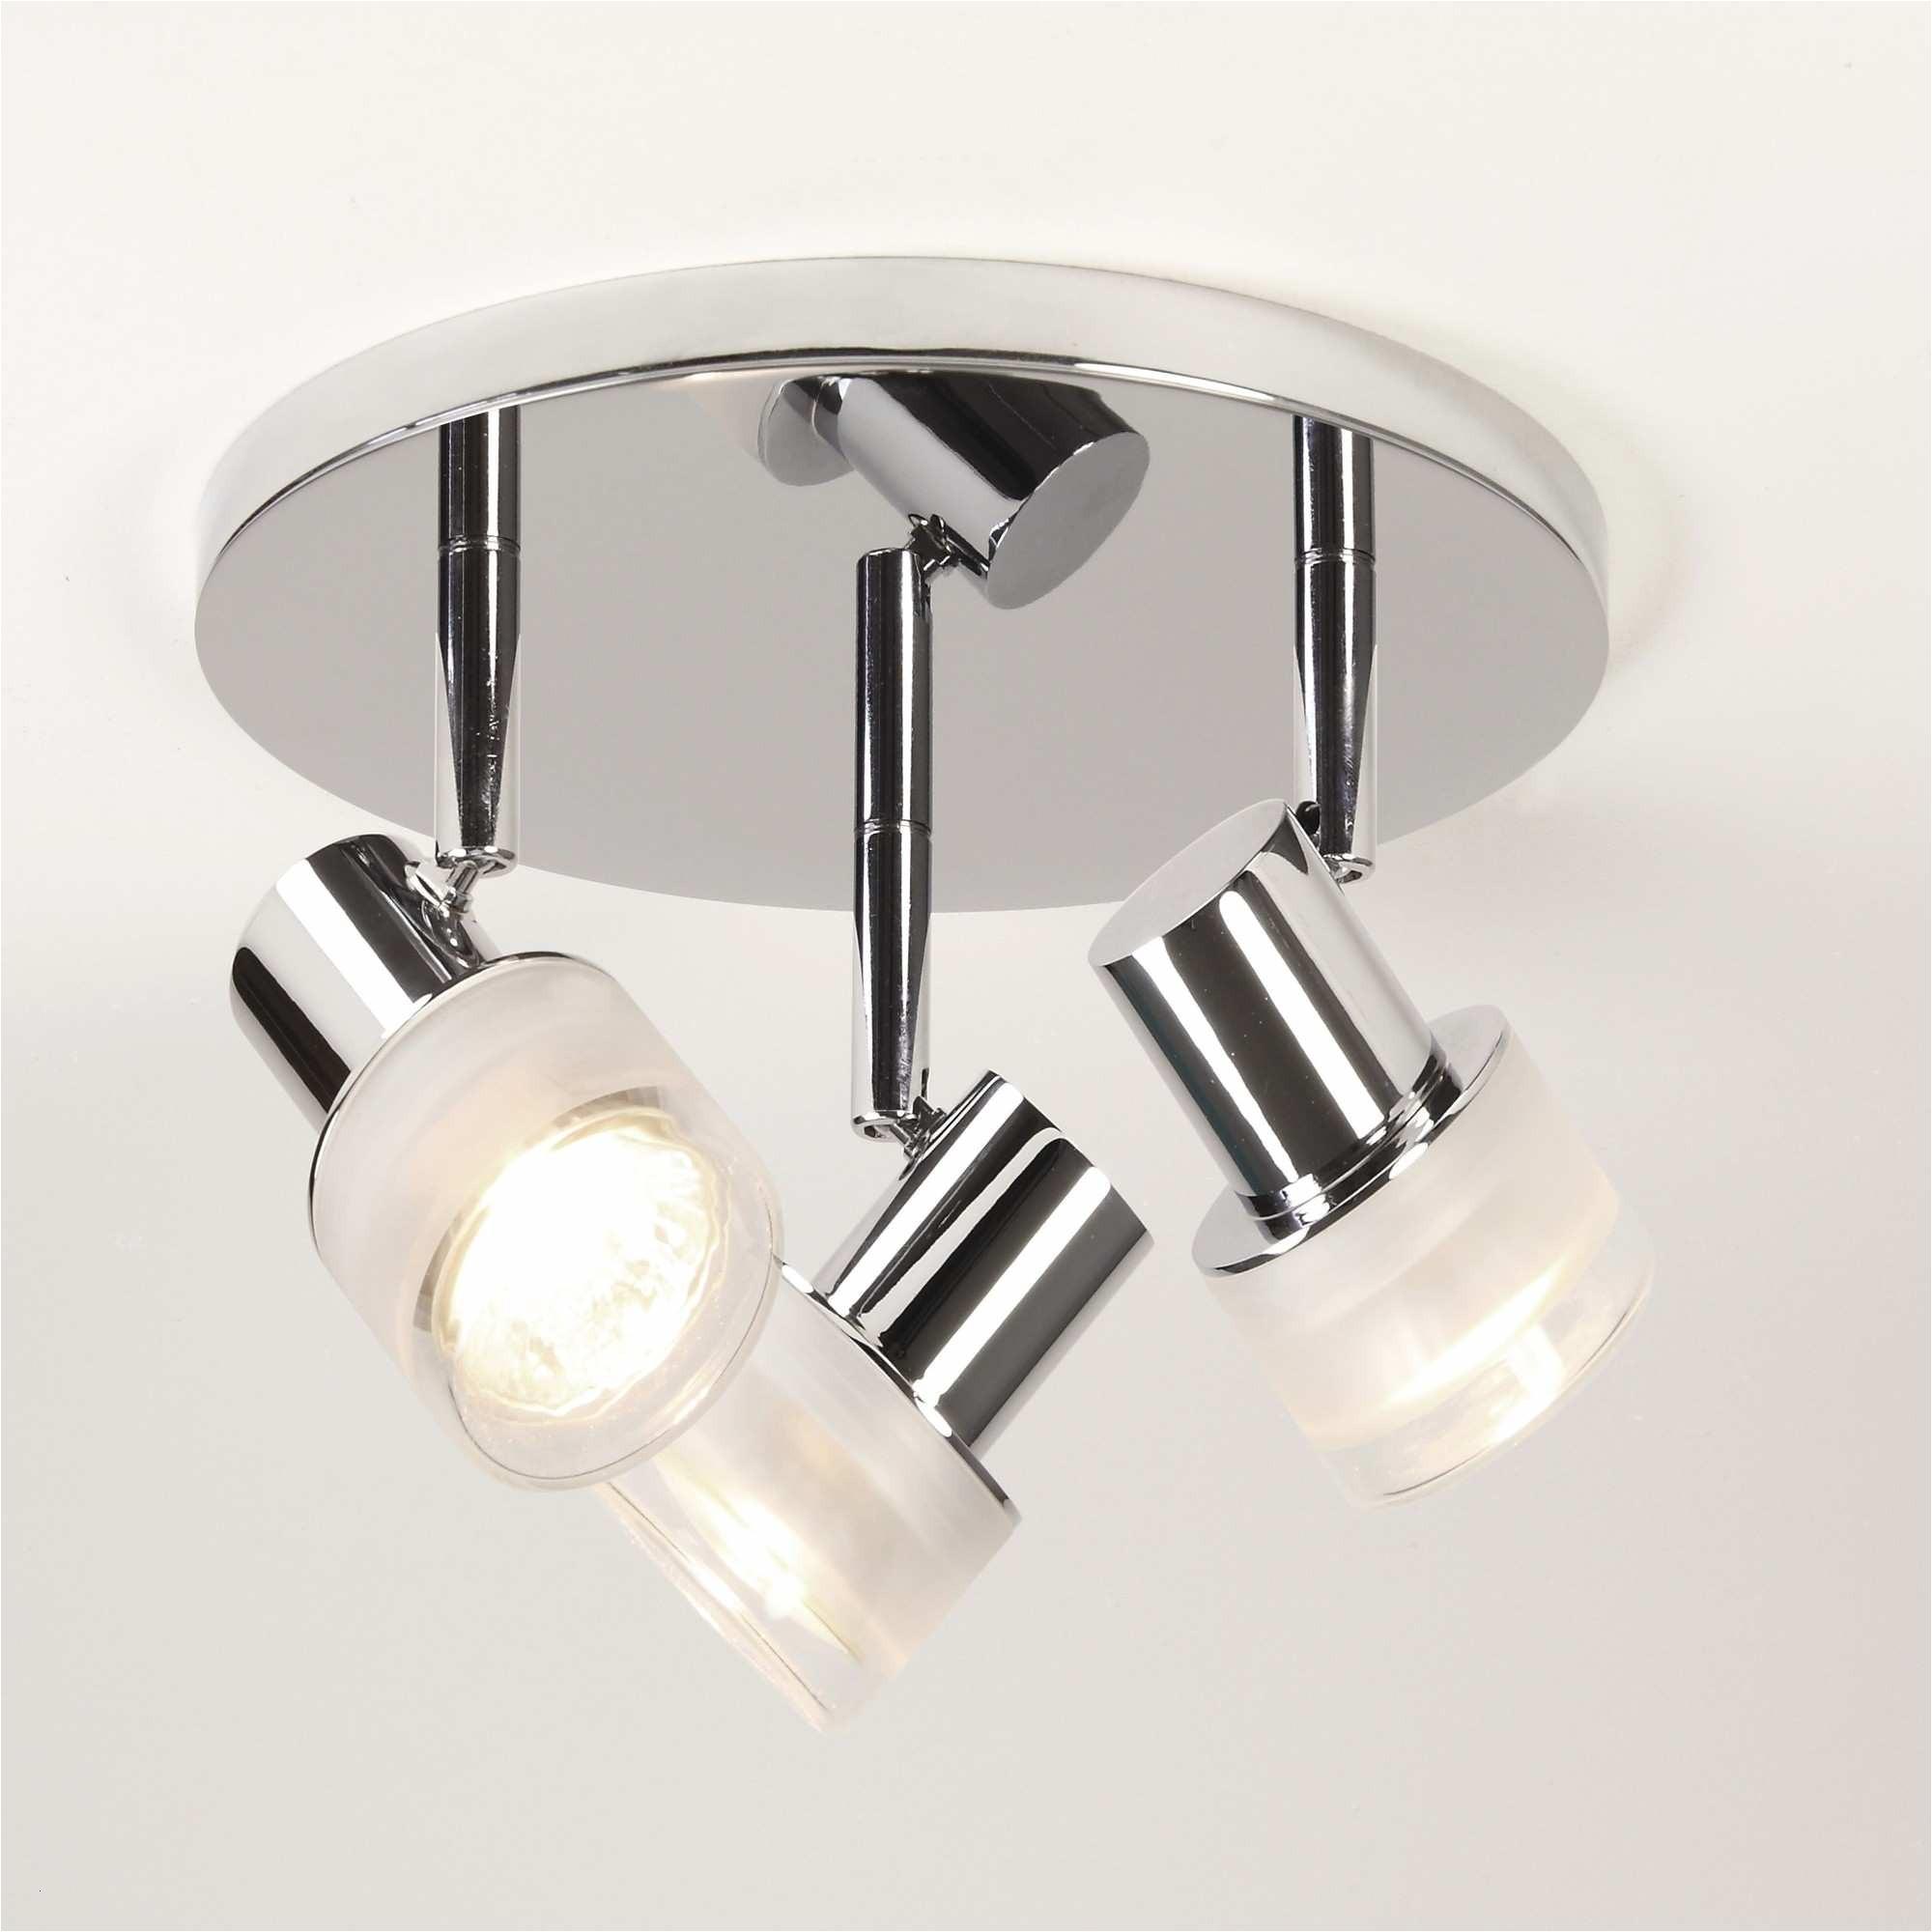 bathroom light fixtures inspirational menards bathroom lighting lovely h sink install bathroom i 0d bathroom